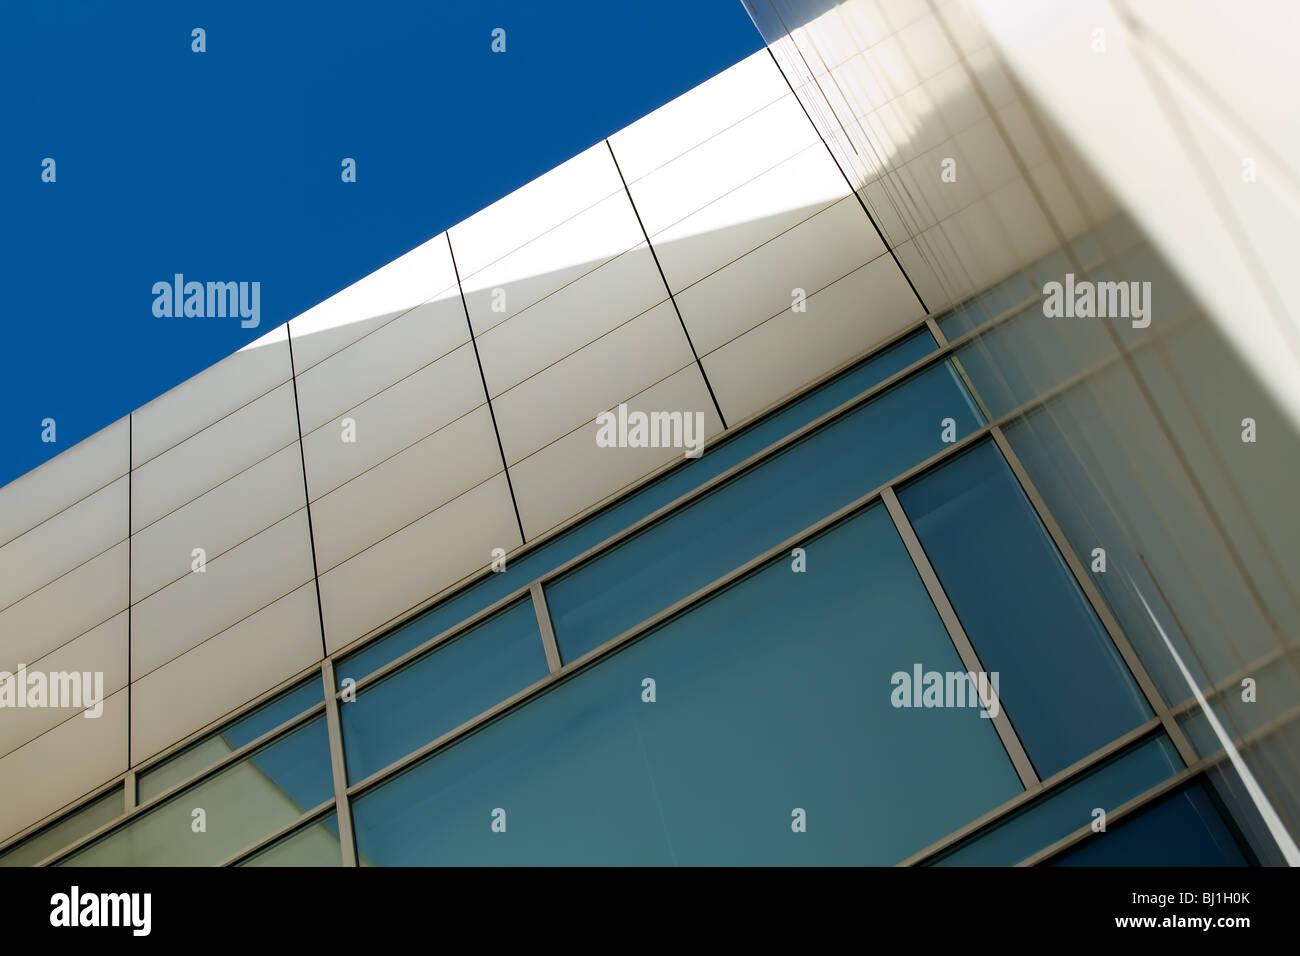 Barcelona Museum of Contemporary Art - MACBA - Stock Image